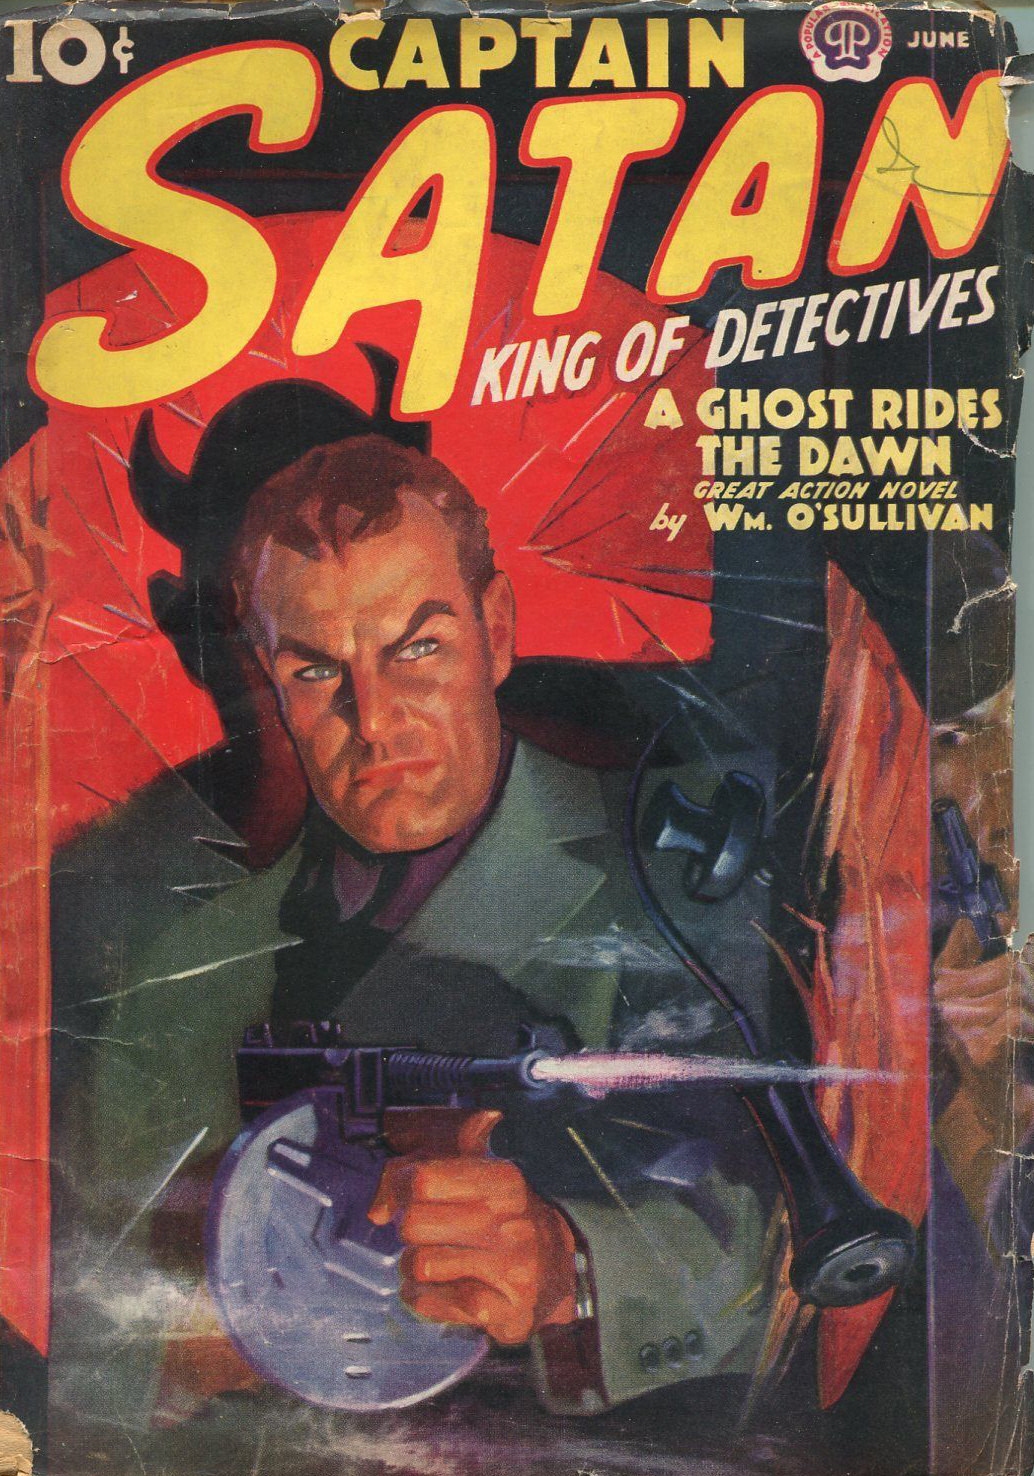 Captain-Satan-June-1938.jpg